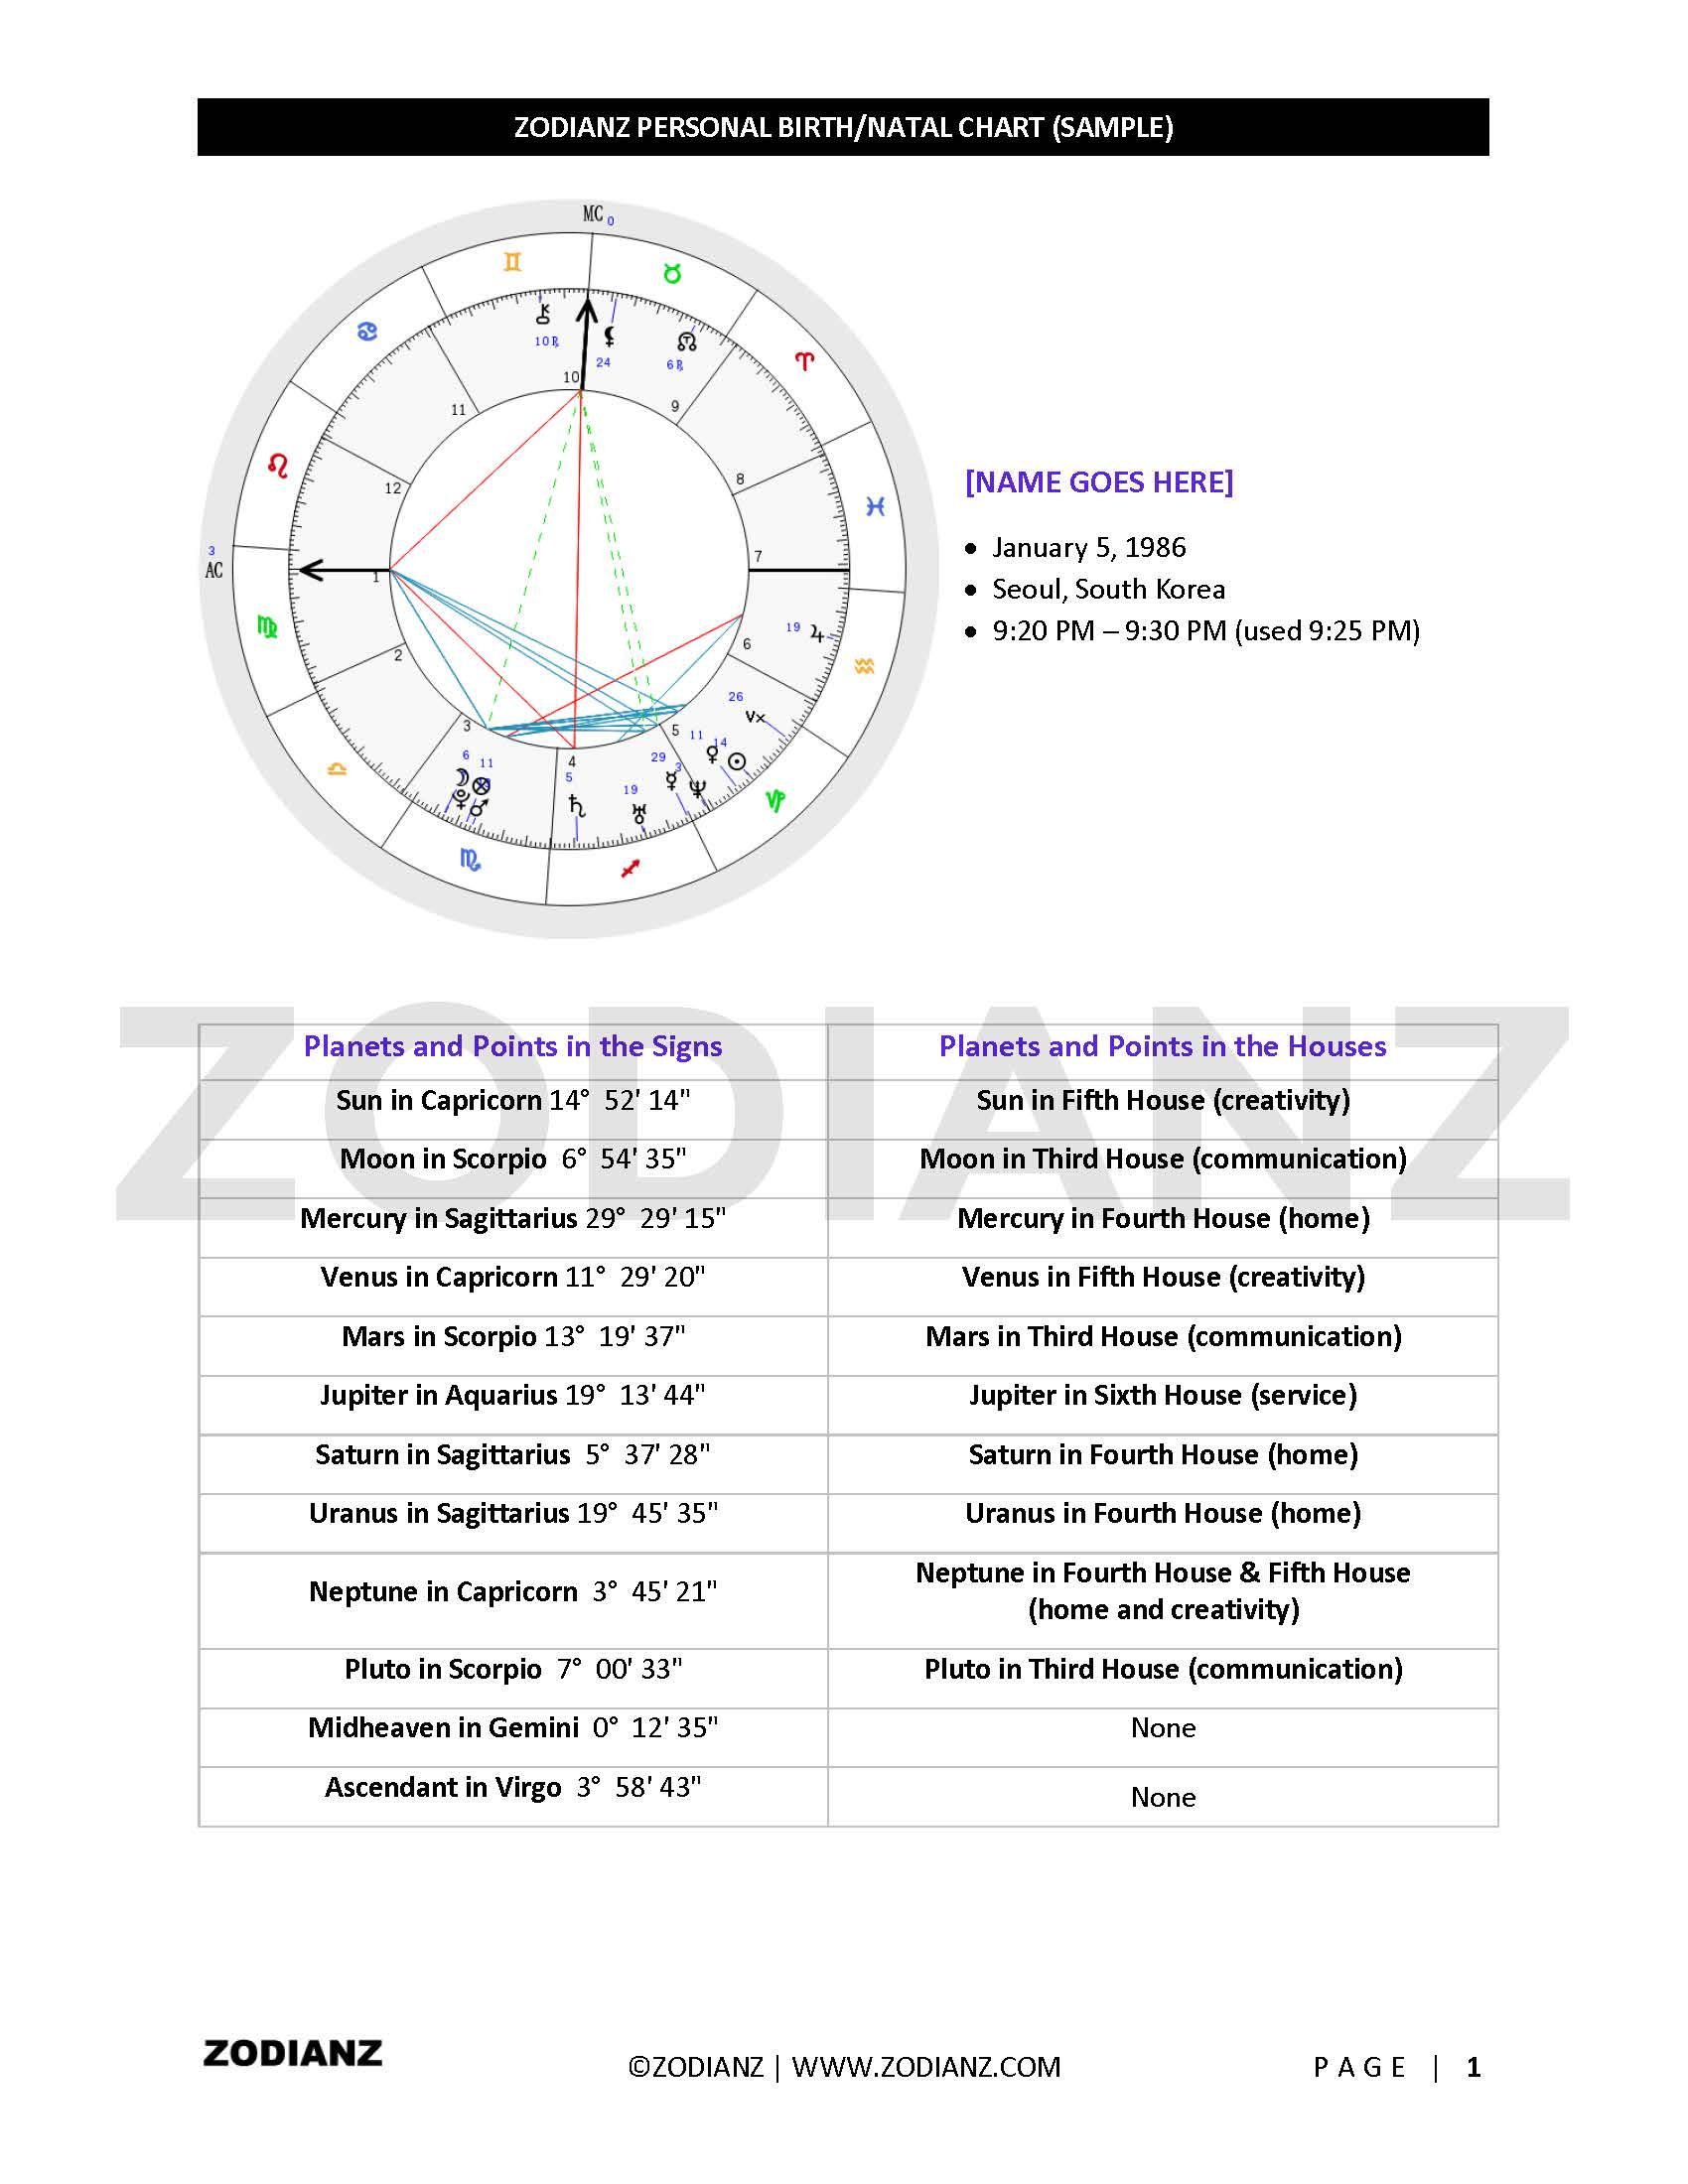 Get A Written Personal Birthnatal Chart By Joan Zodianz